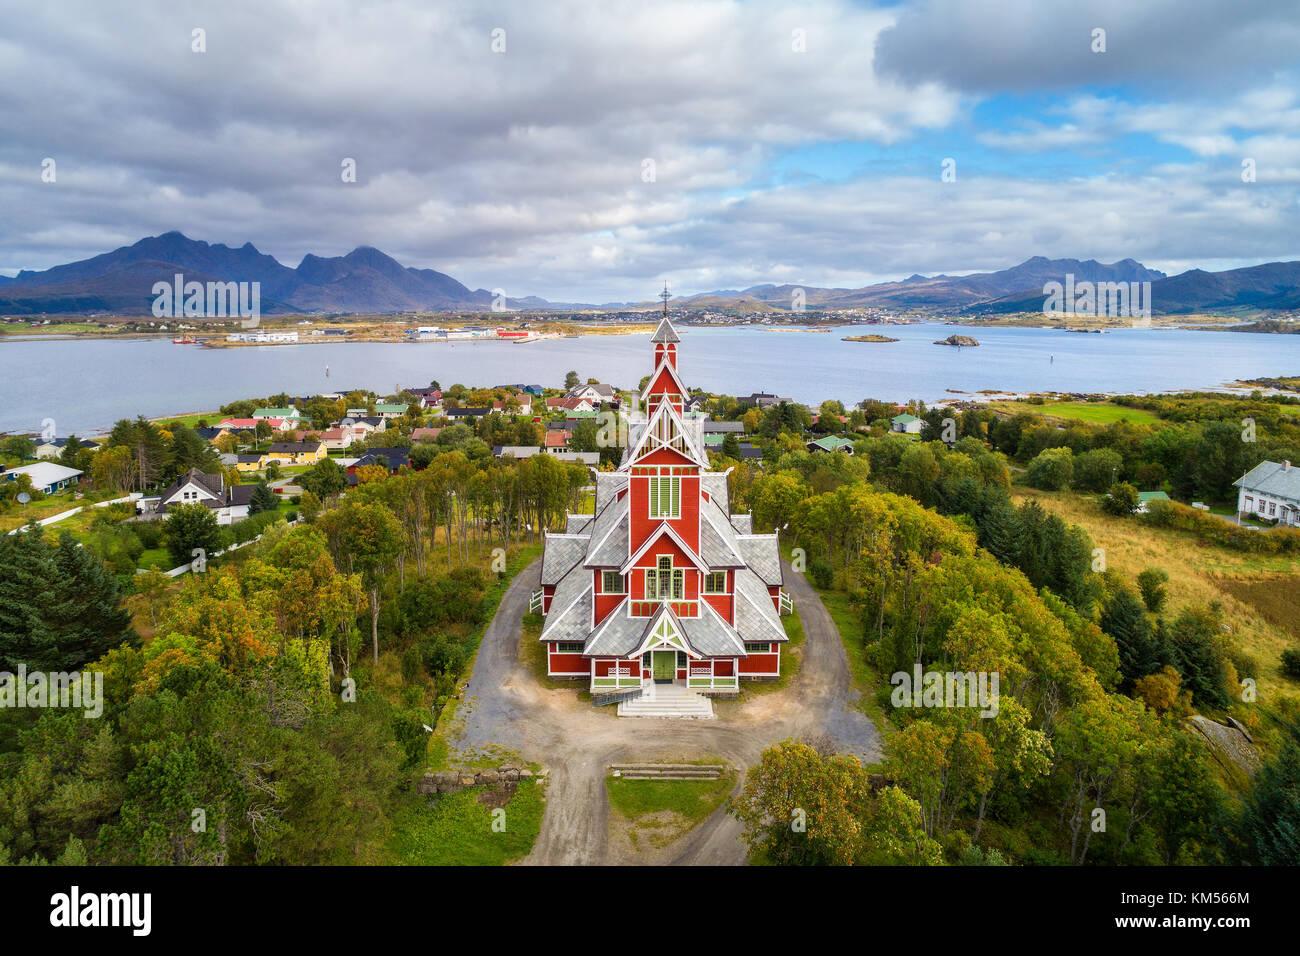 Buksnes Church in the village of Gravdal on Lofoten islands - Stock Image